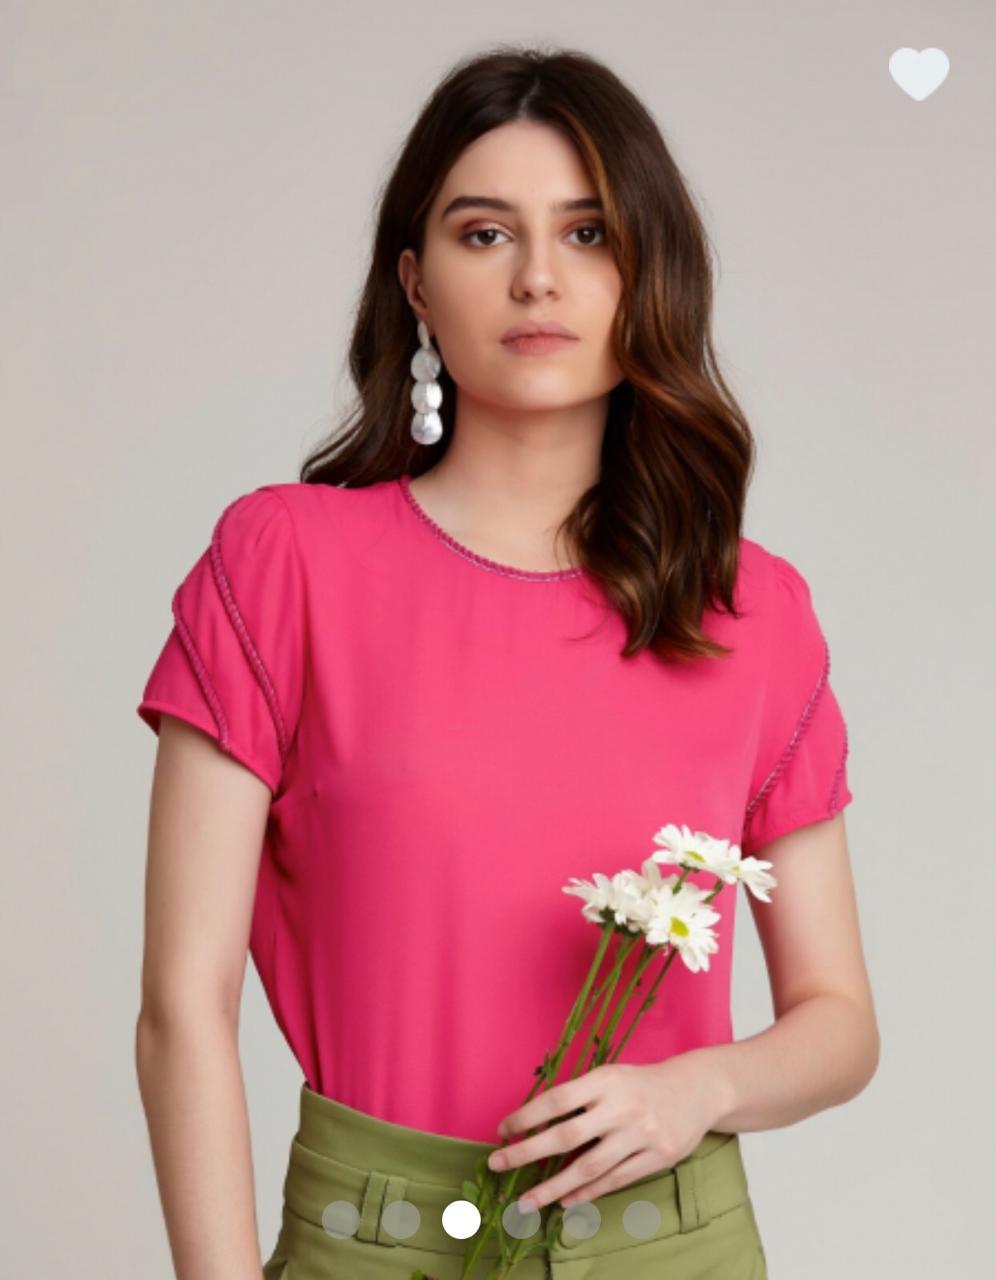 Blusa Gisele Crepe Detalhe Vivos Cores Pink ,Verde e Amarelo